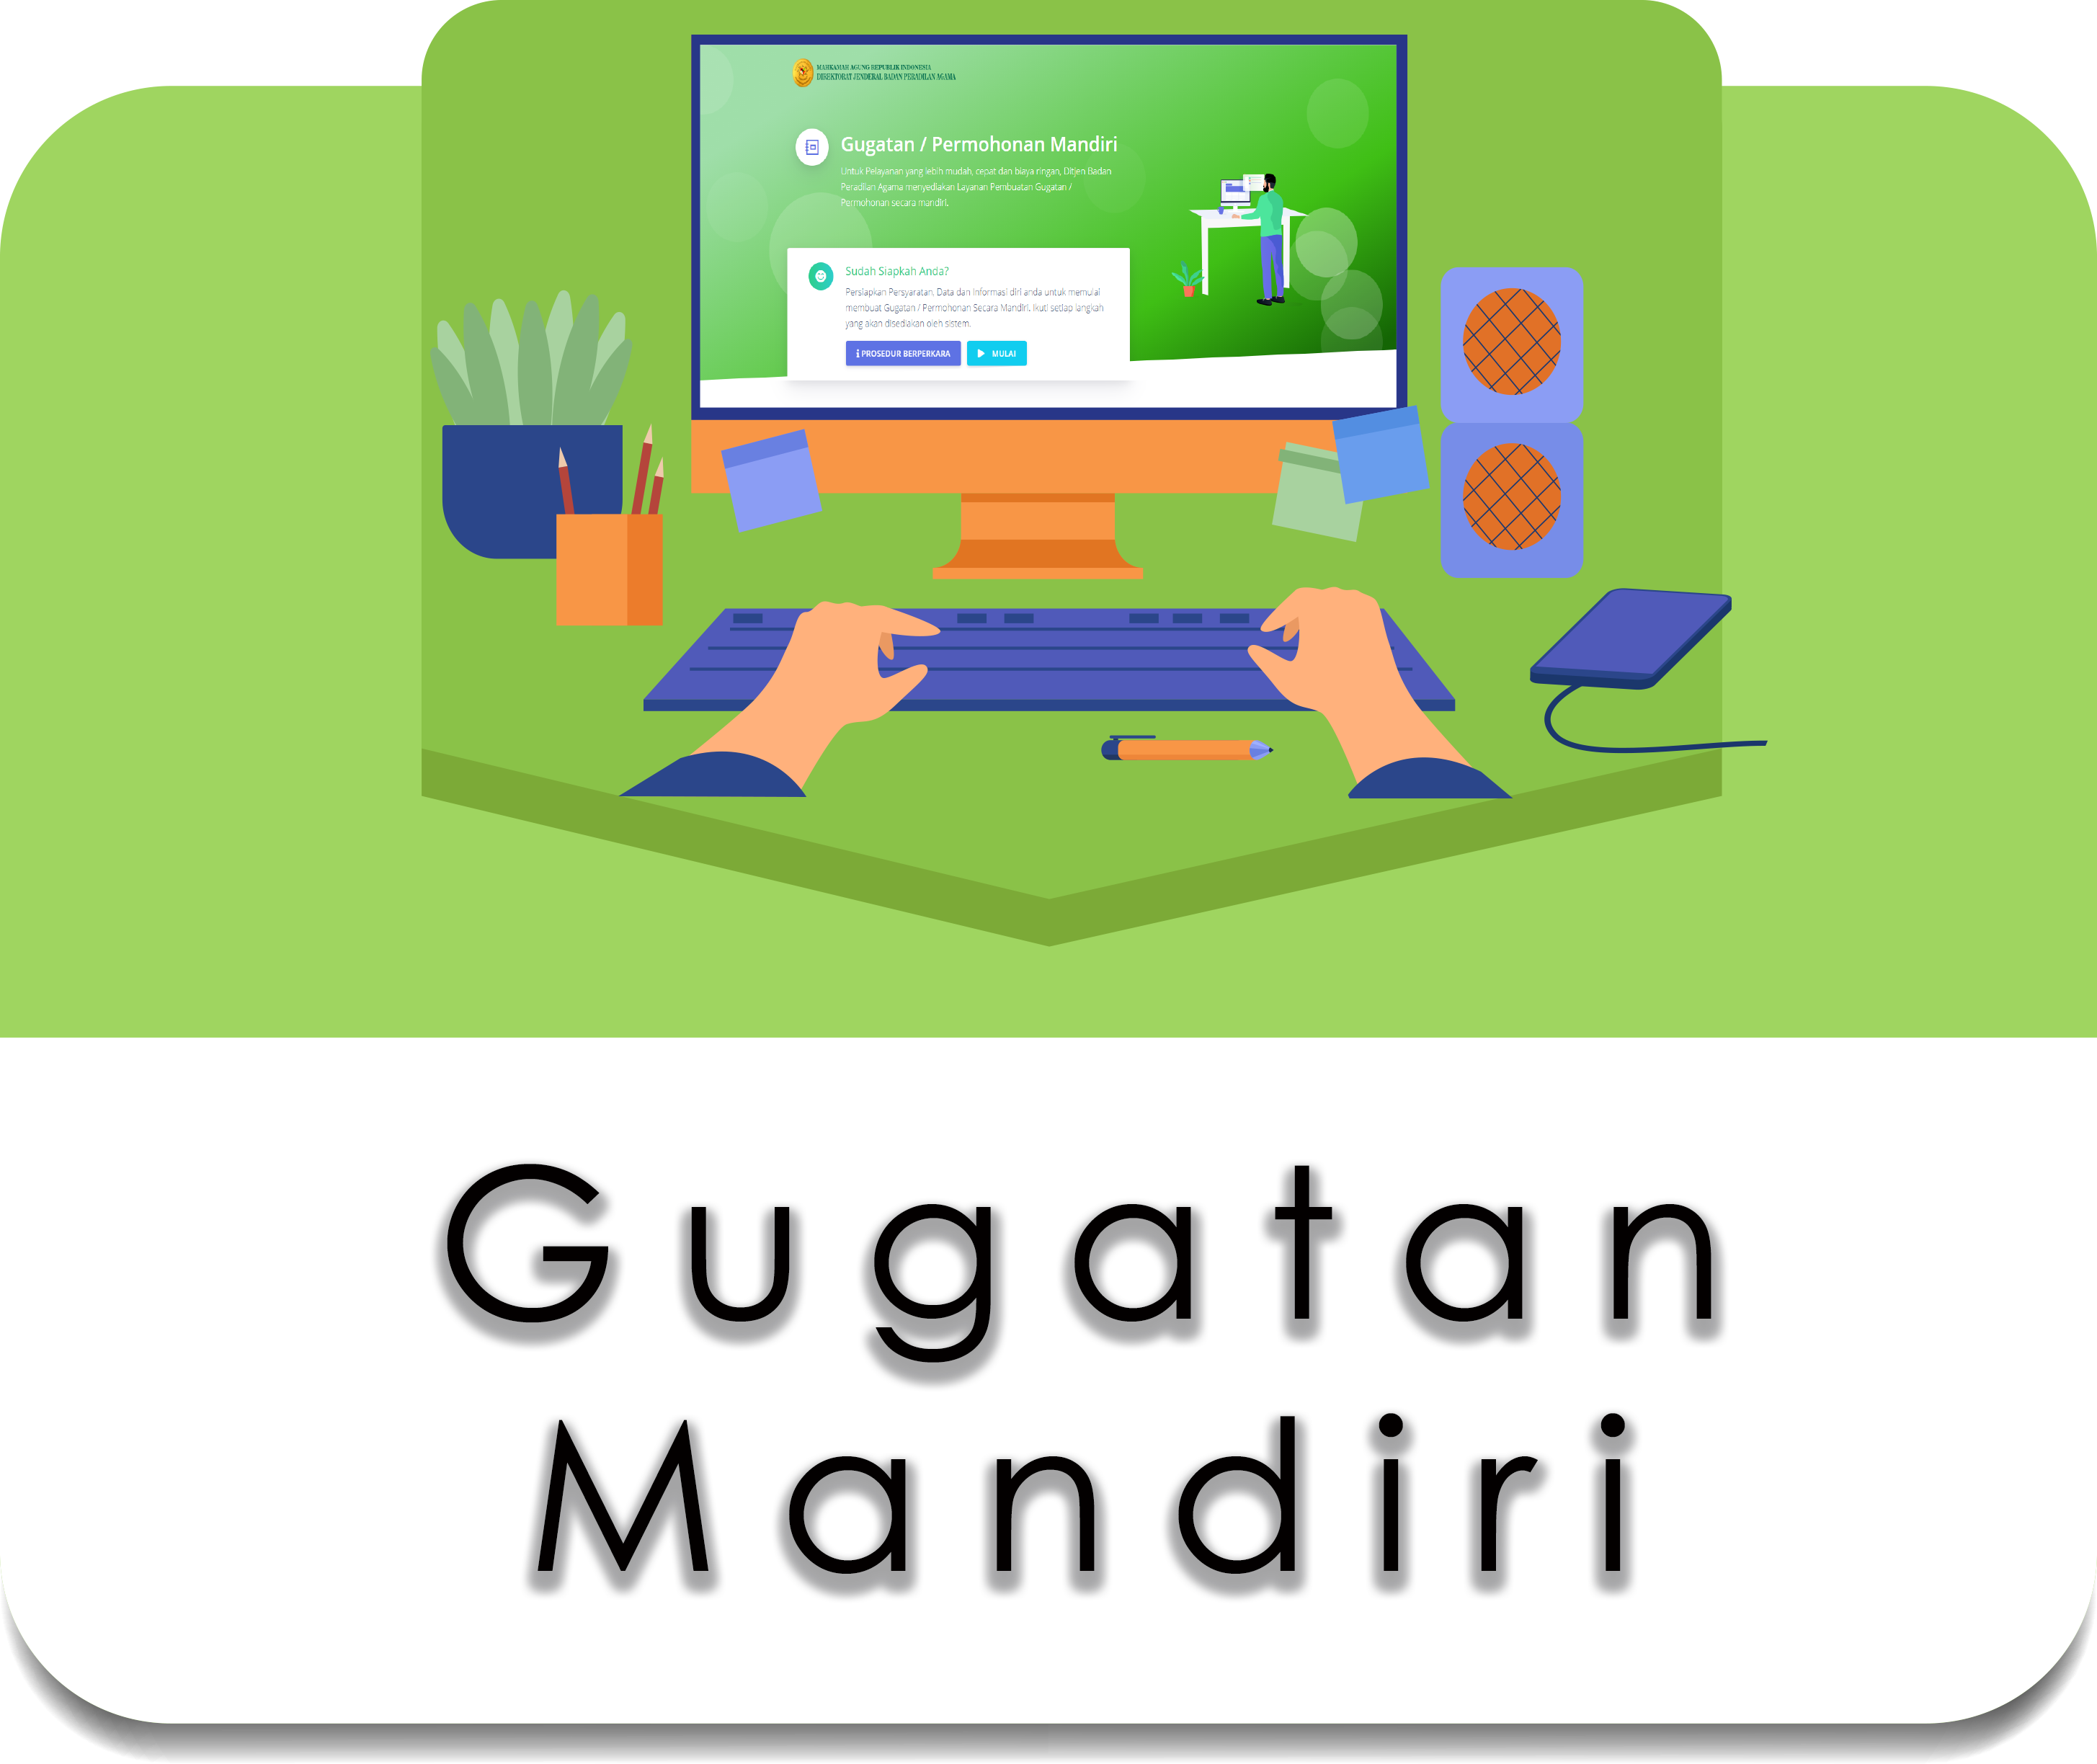 GUGATAN MANDIRI